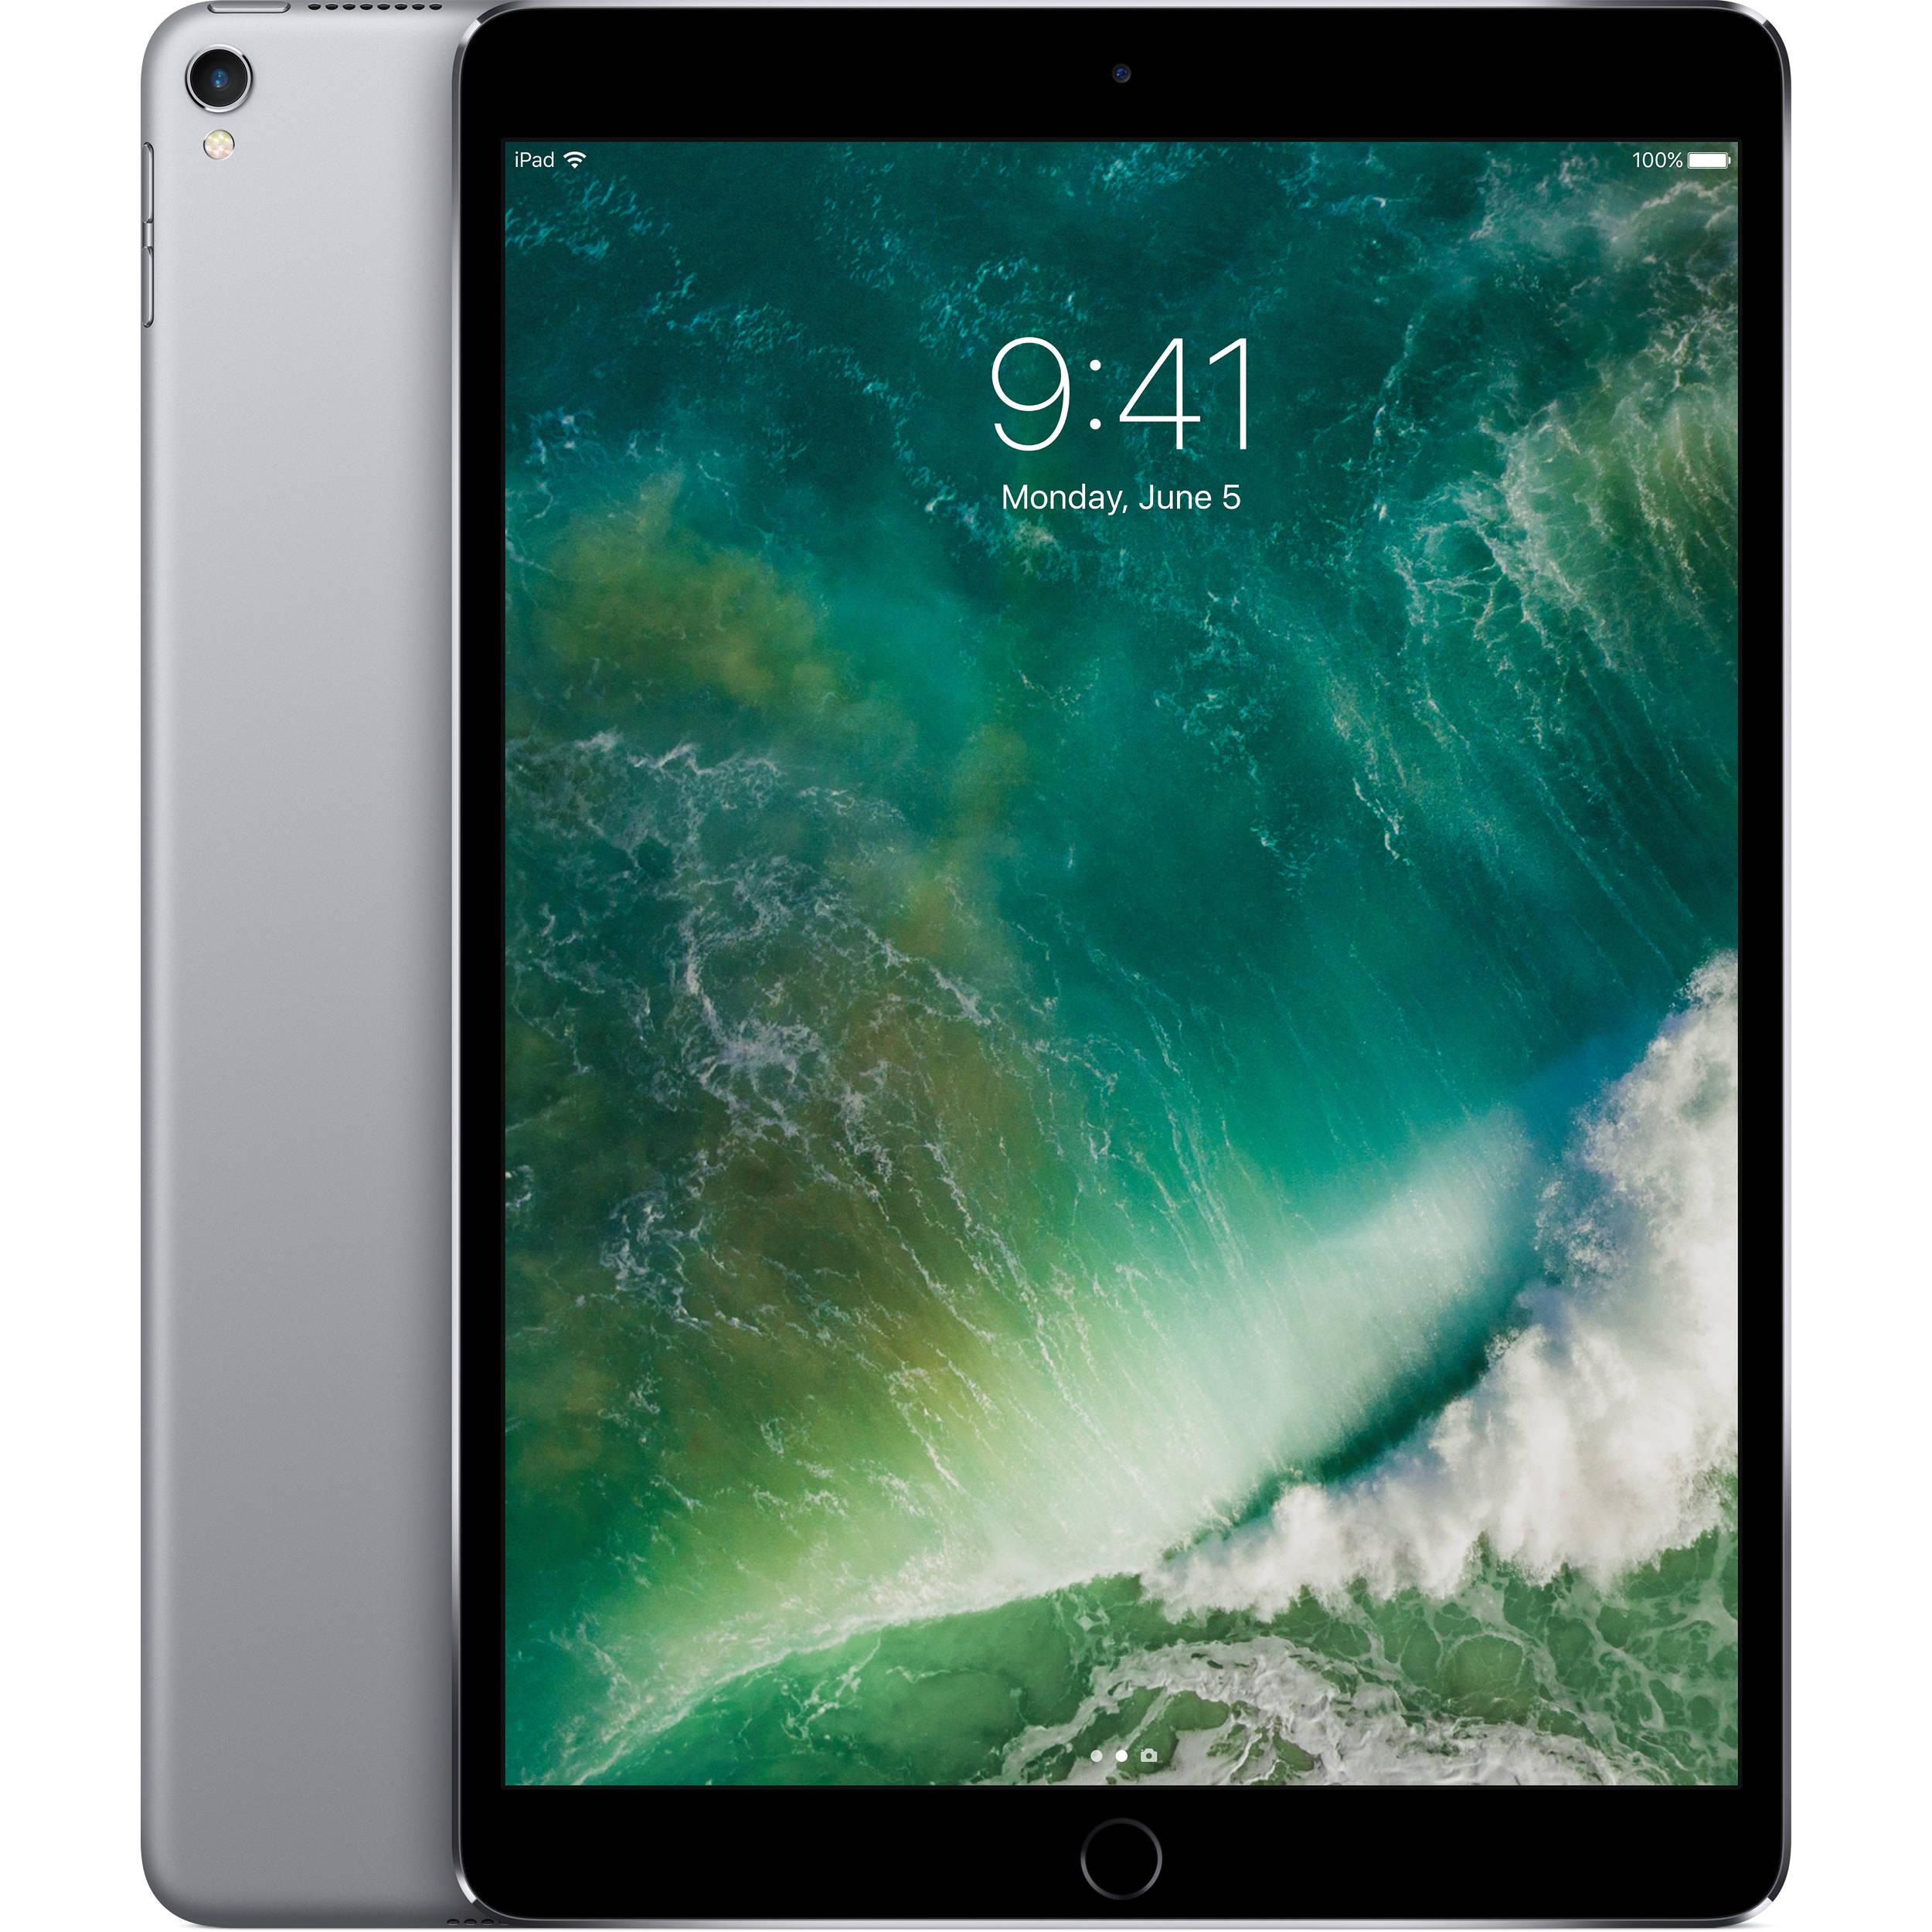 Apple 105 iPad Pro 64GB WiFi Space Gray MQDT2LLA